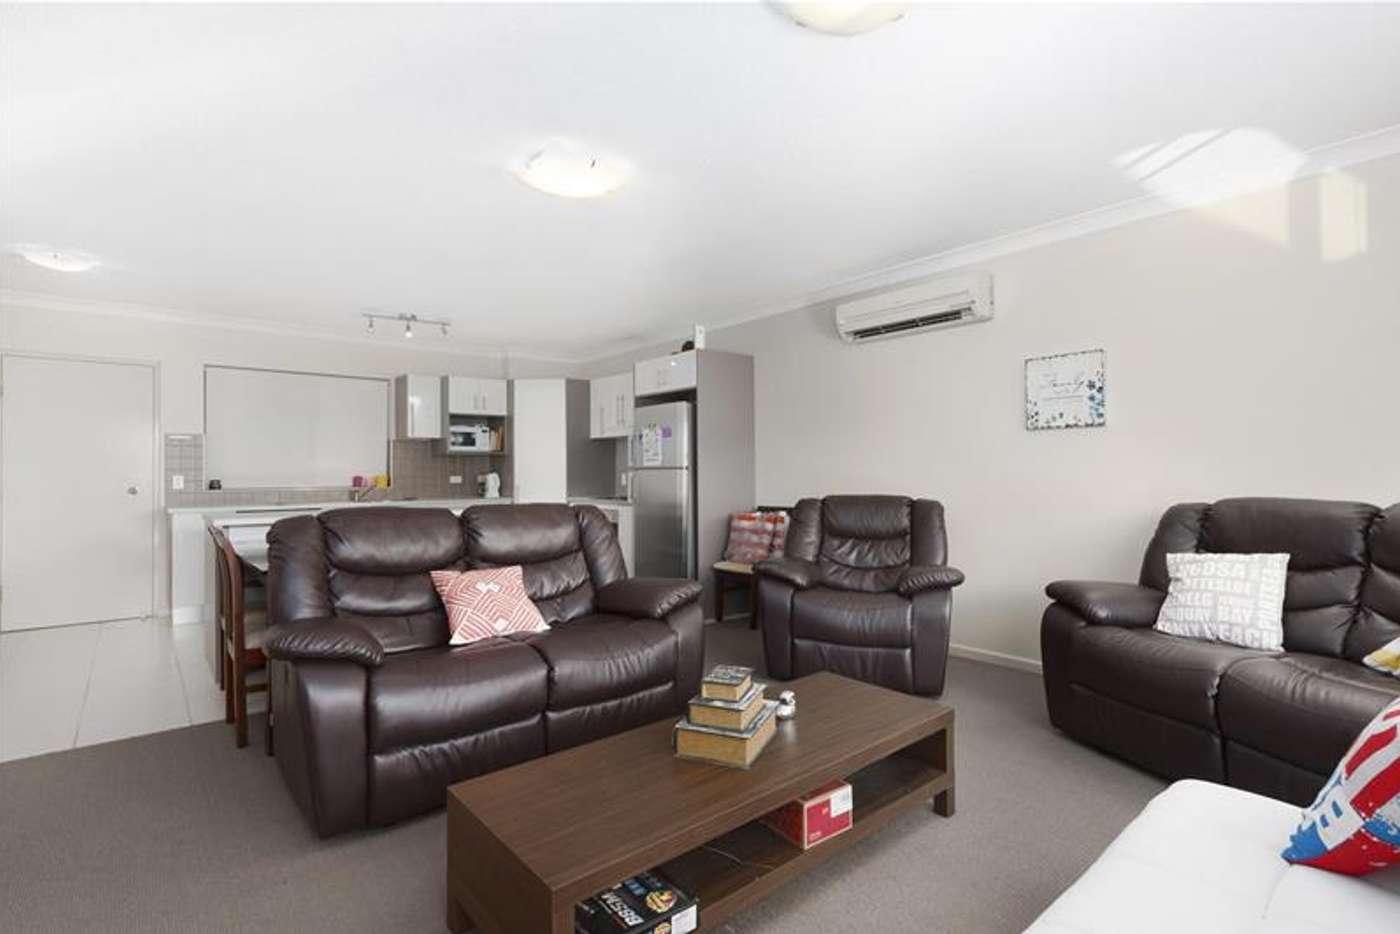 Main view of Homely apartment listing, 04/111 Samford Road, Enoggera QLD 4051